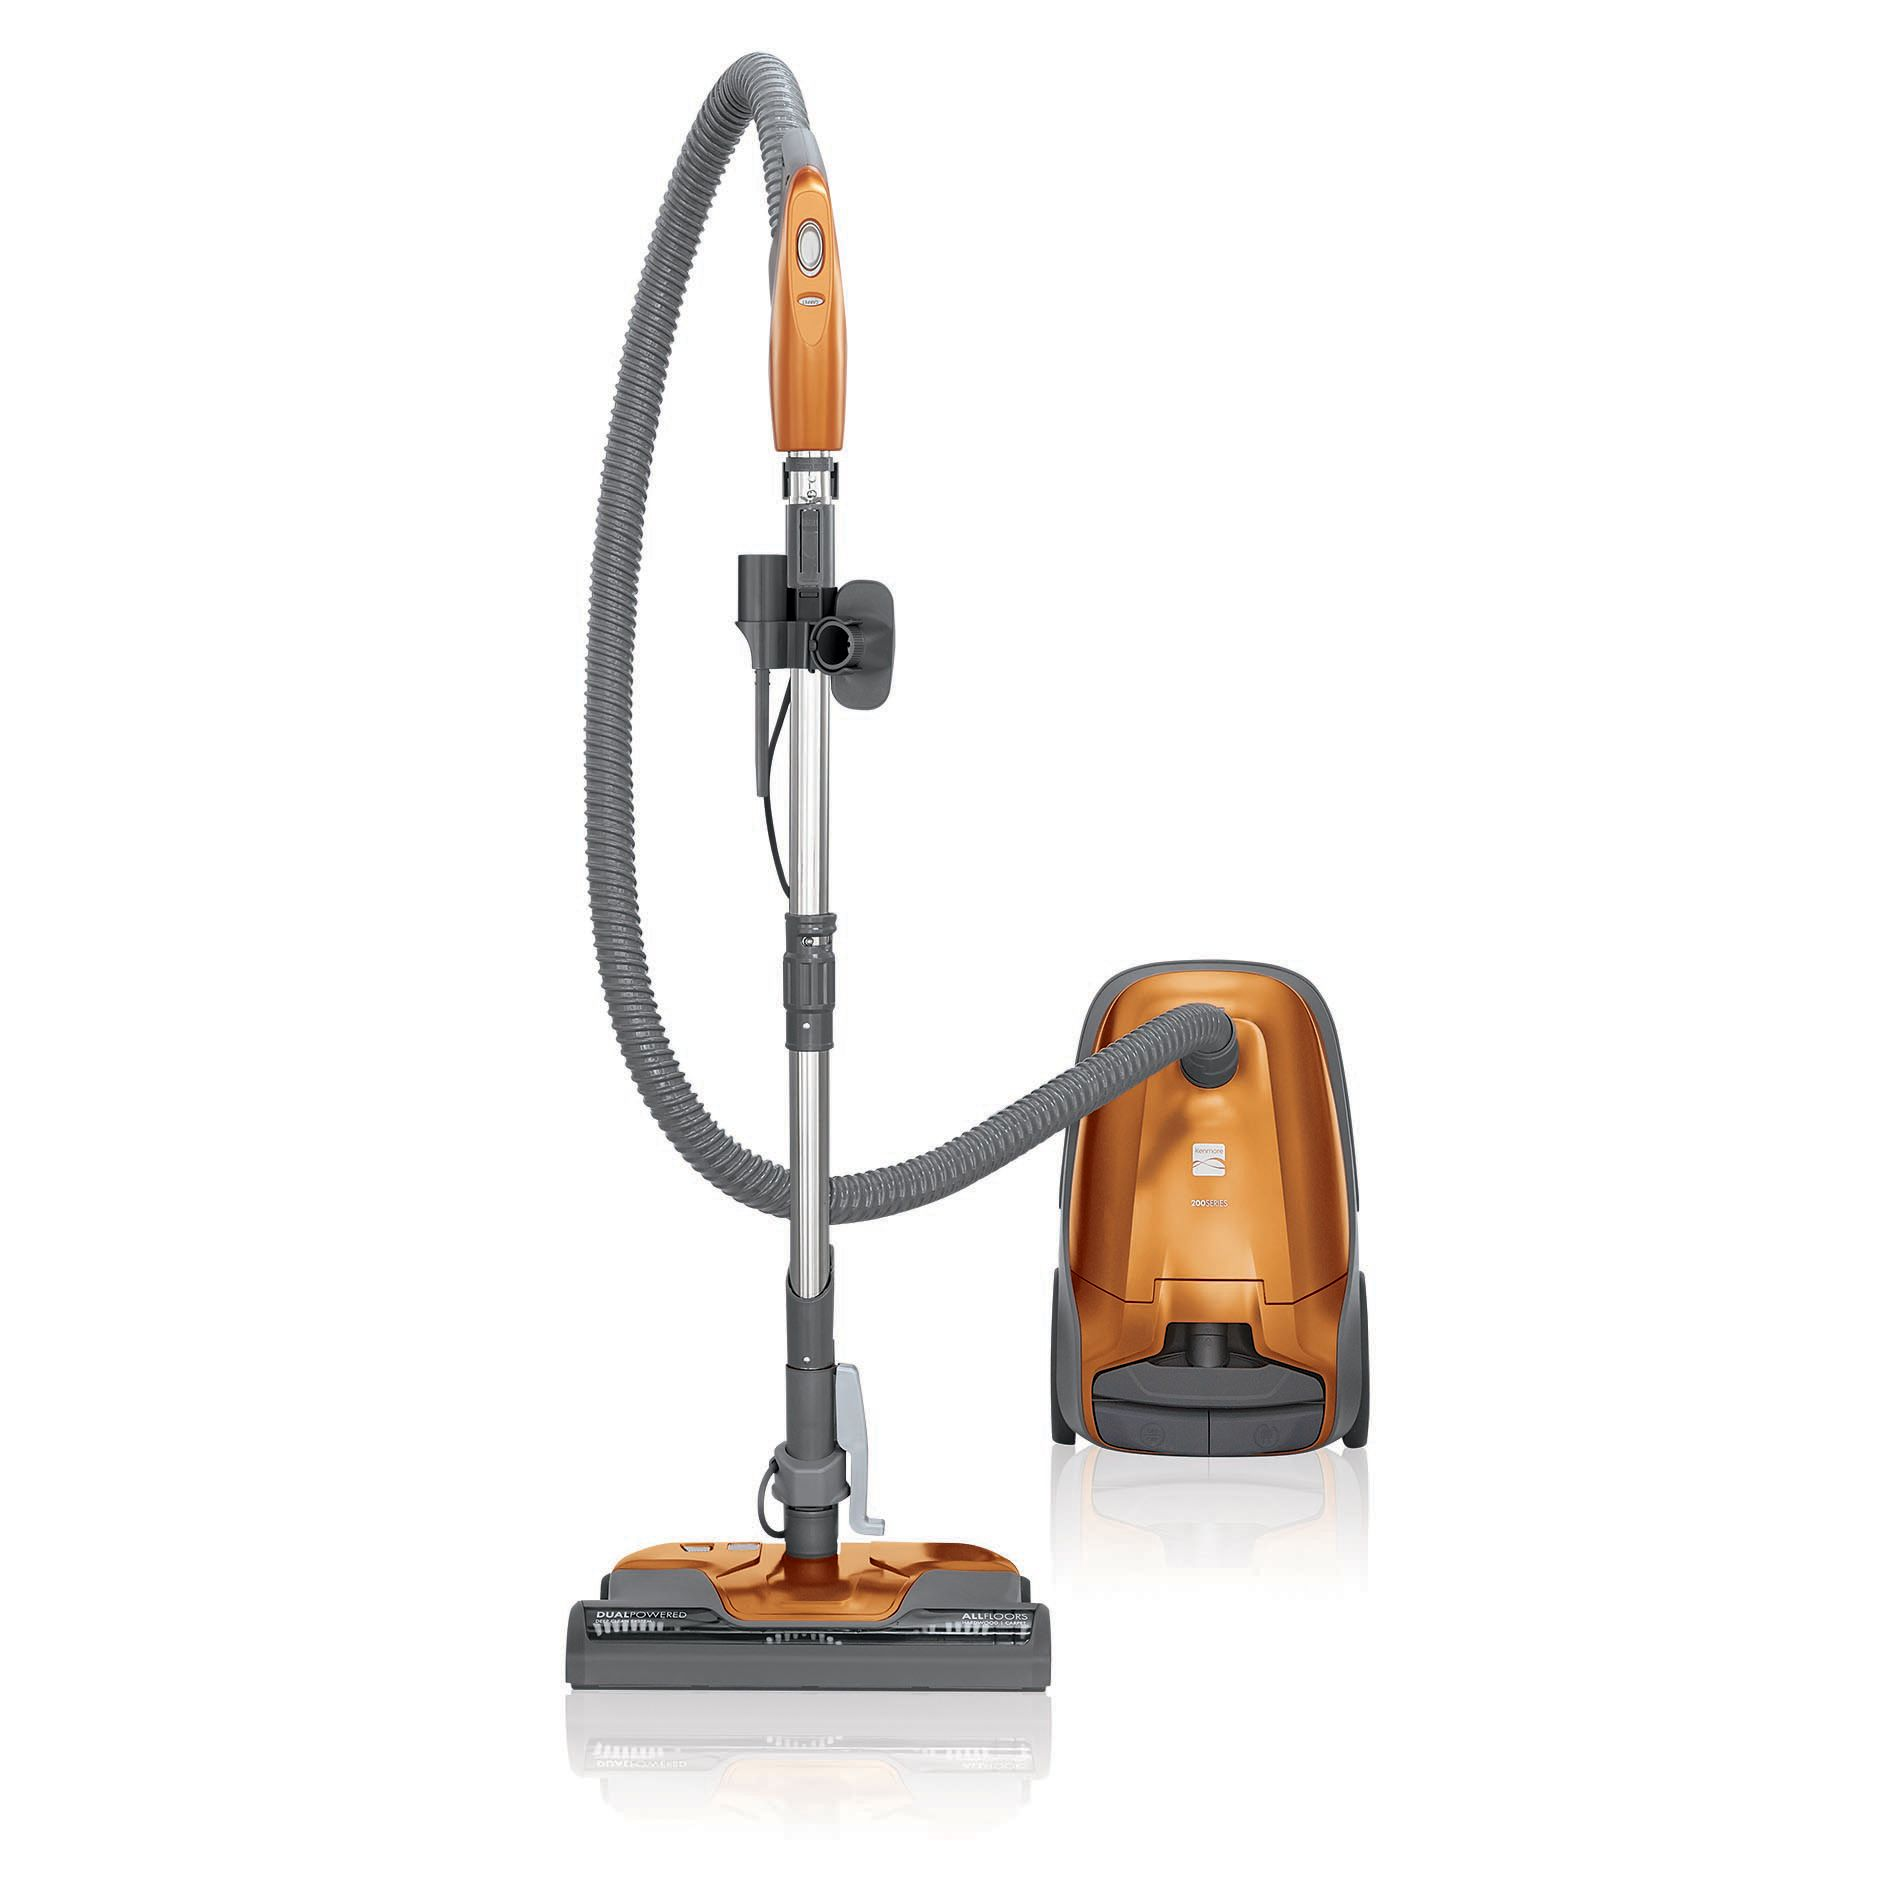 Kenmore 81214 200 Series Bagged Canister Vacuum Orange In 2020 Canister Vacuum Canister Vacuum Cleaner Vacuum Cleaner